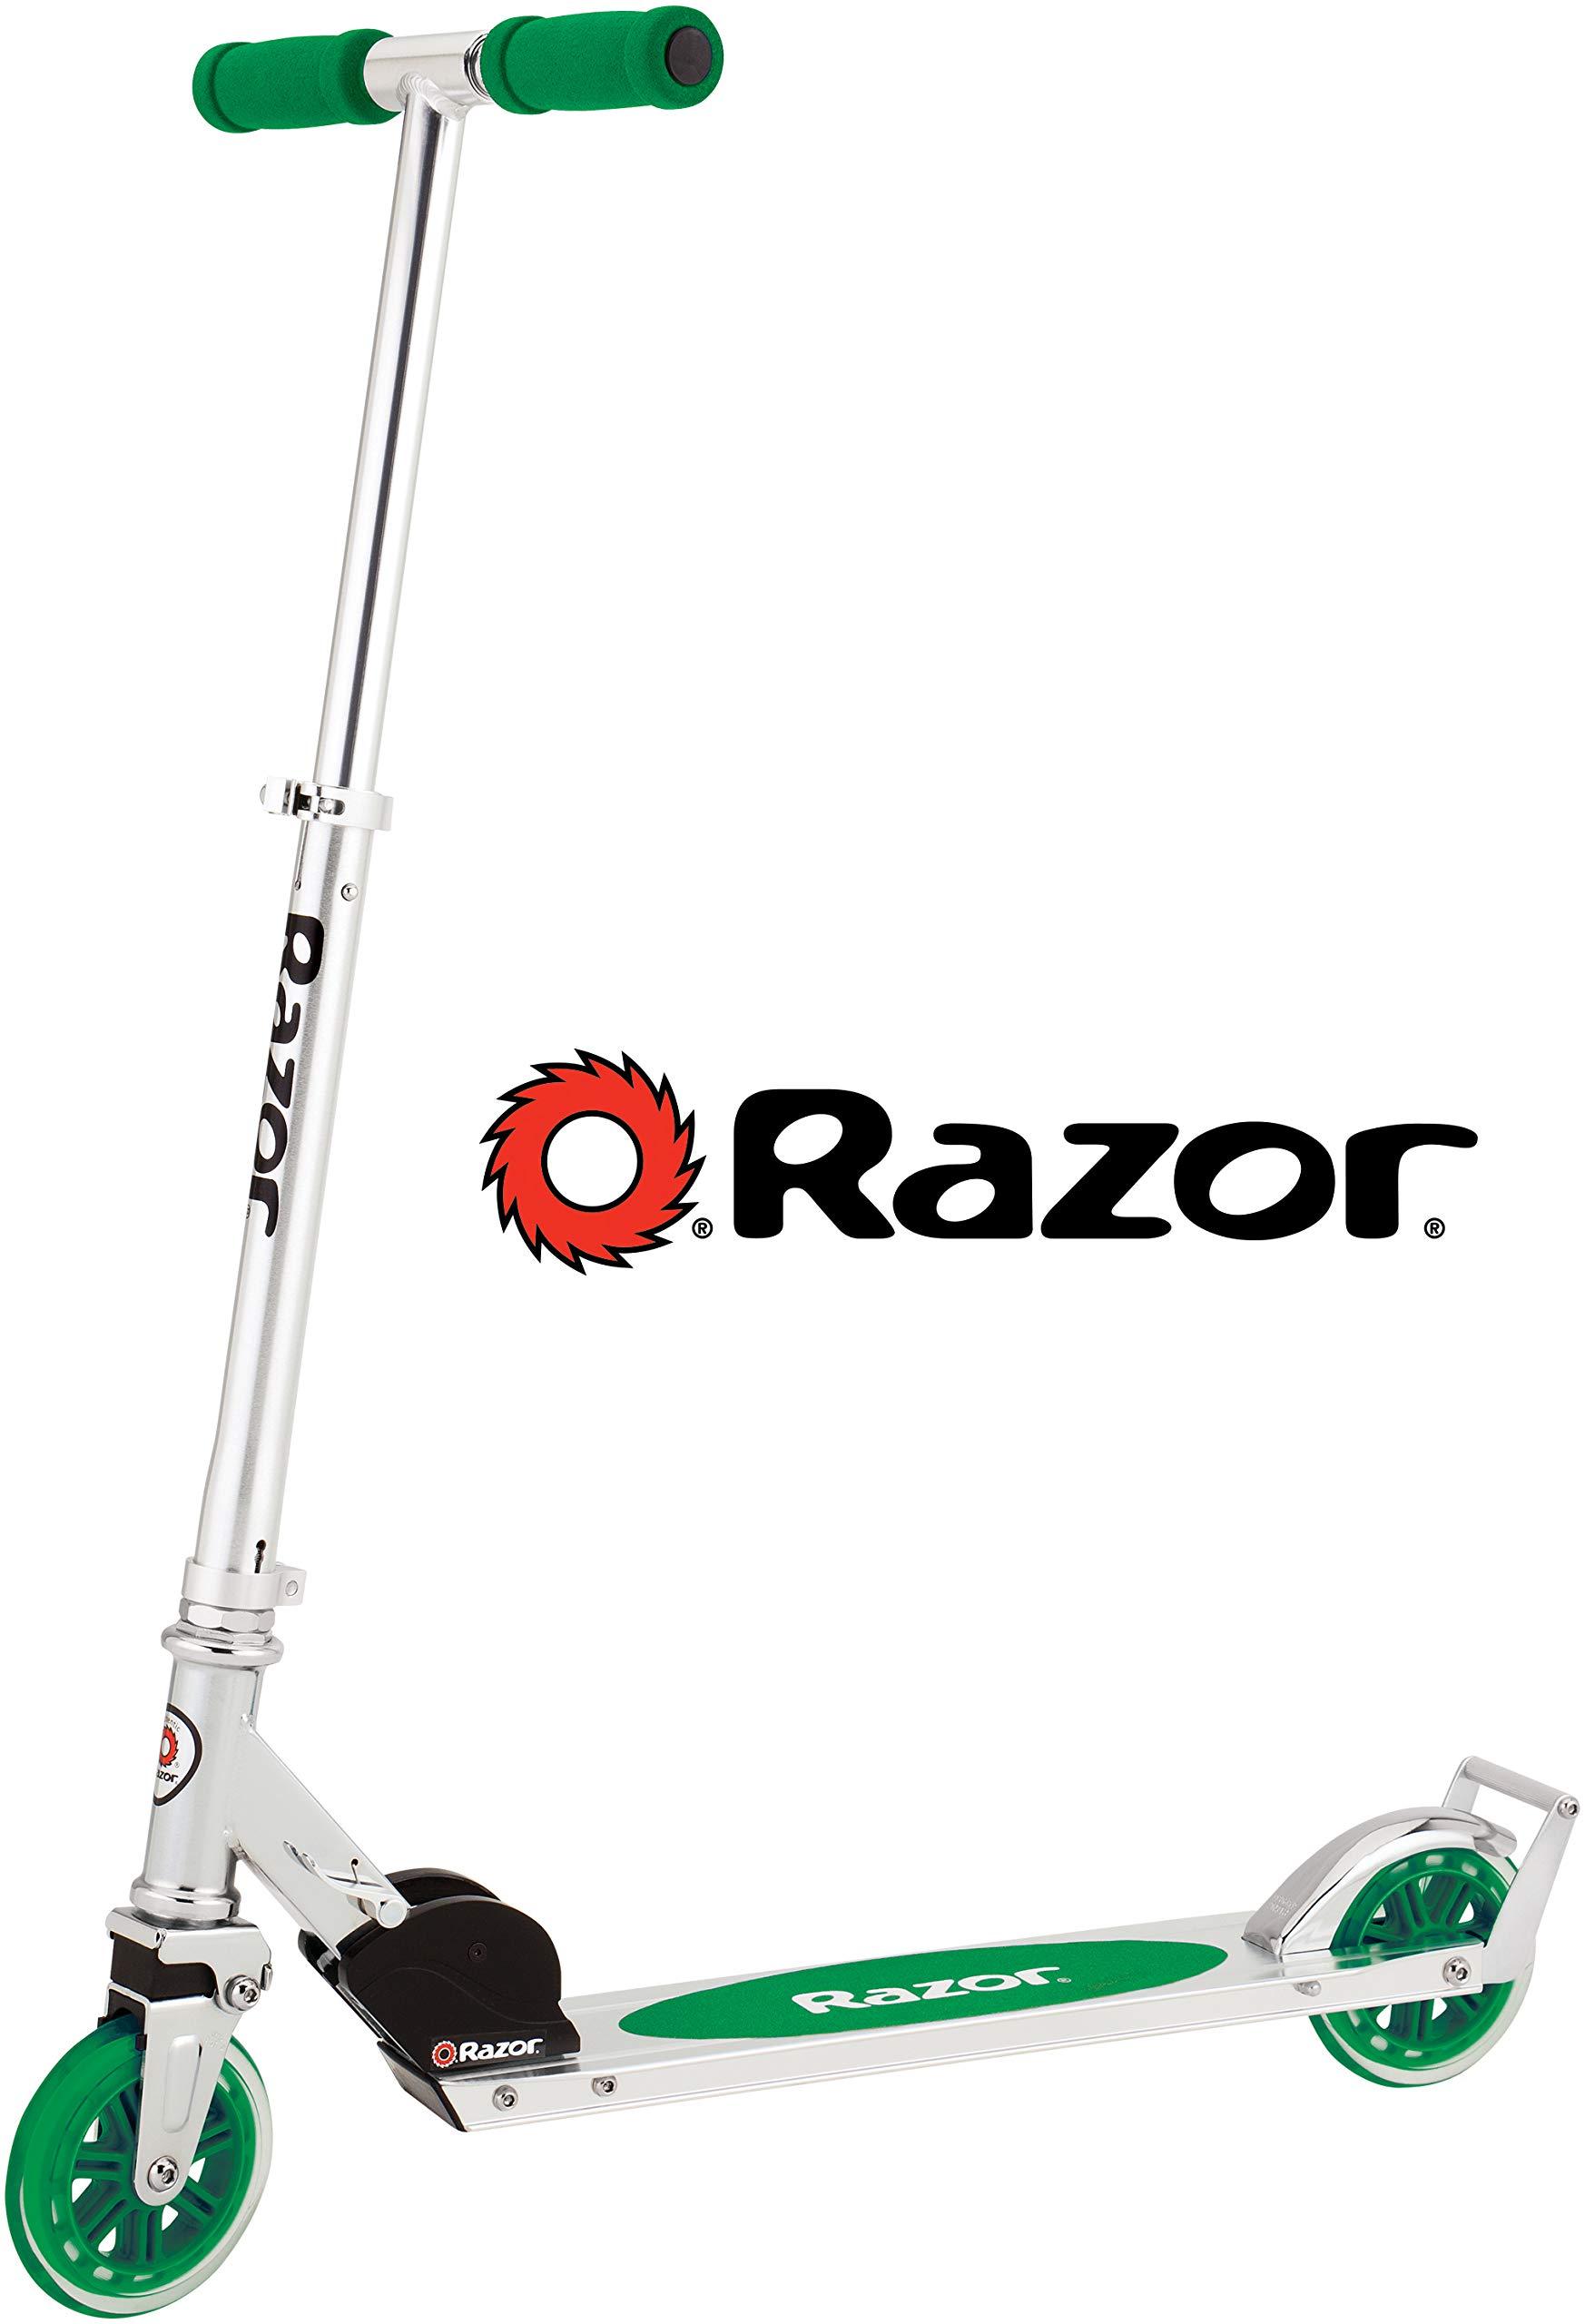 Razor A3 Kick Scooter - Green - FFP by Razor